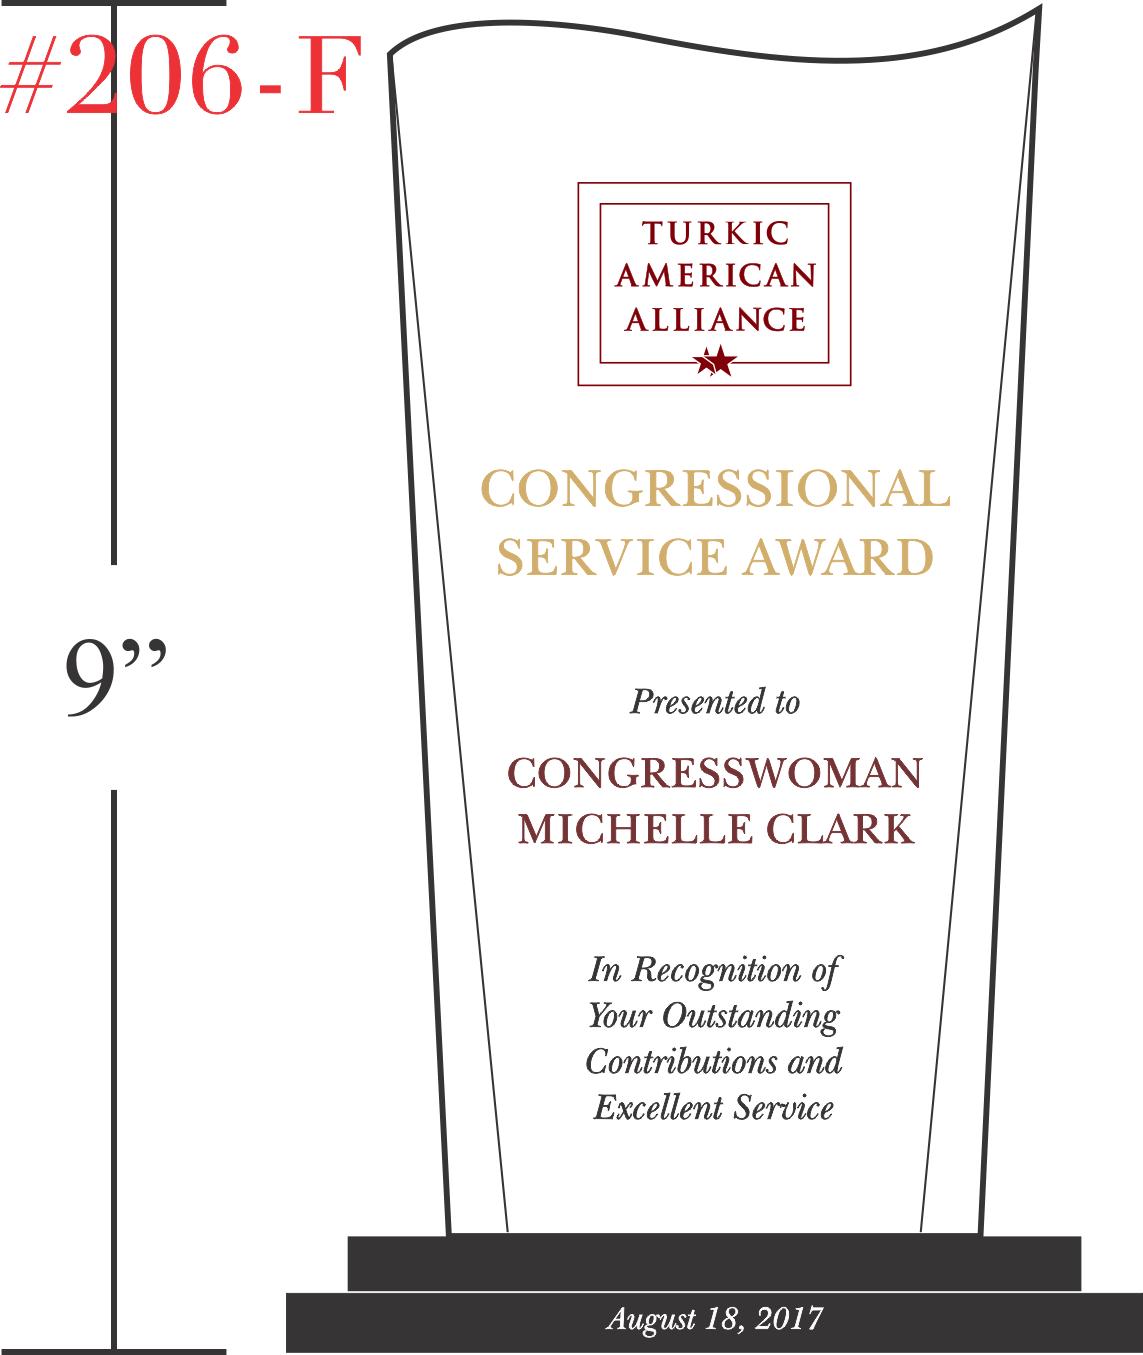 Congressional Service Award